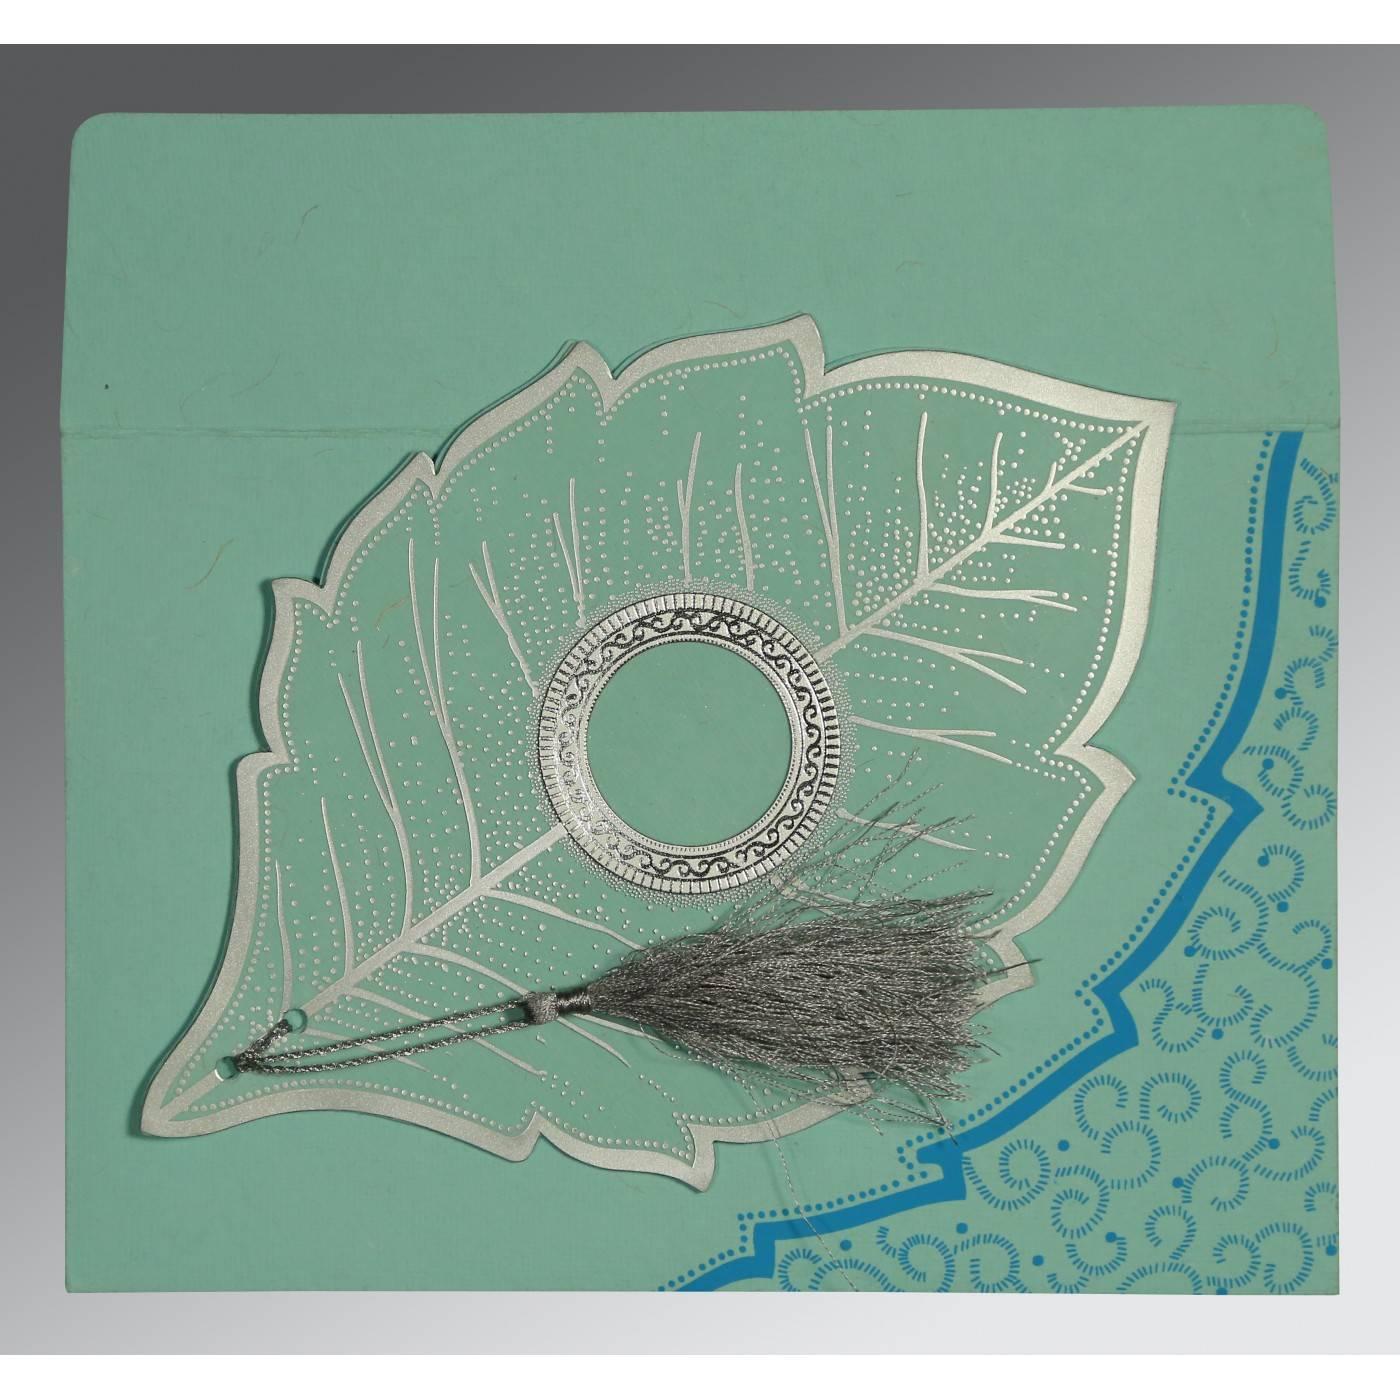 AQUA HANDMADE COTTON FLORAL THEMED - FOIL STAMPED WEDDING CARD : CG-8219C - IndianWeddingCards